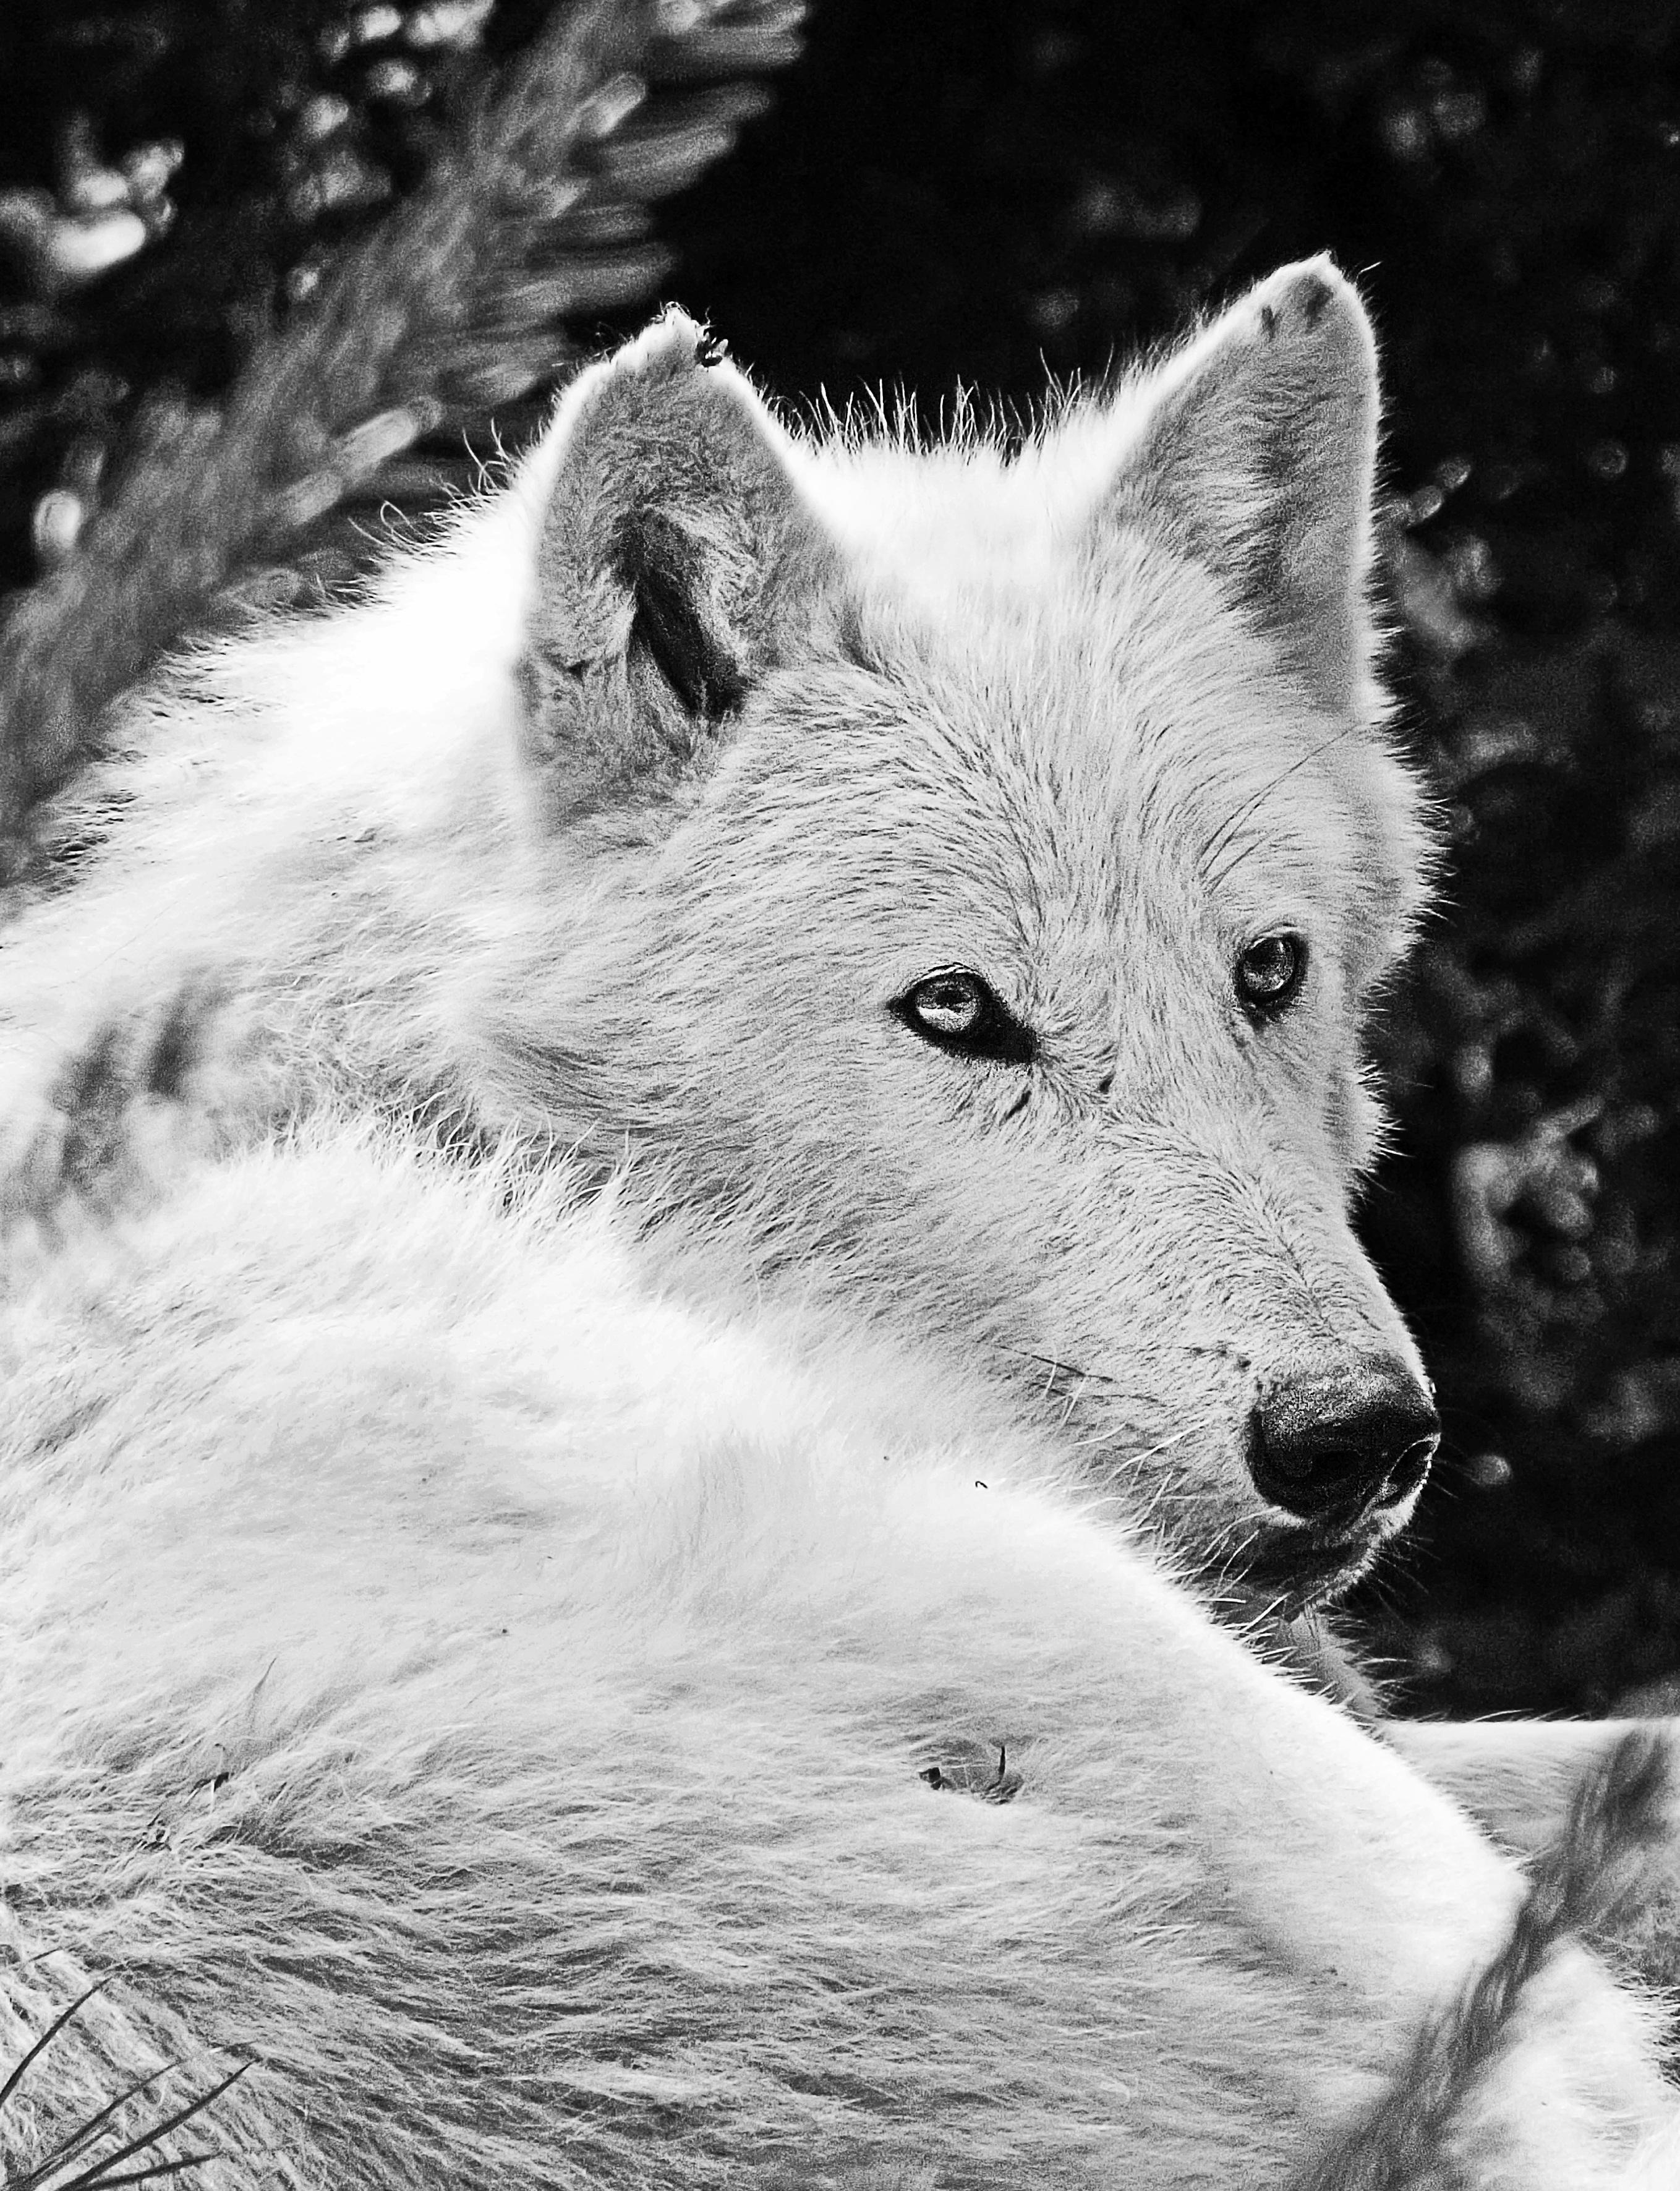 Snow winter black and white hair wildlife mammal wolf monochrome season arctic fox beast vertebrate monochrome